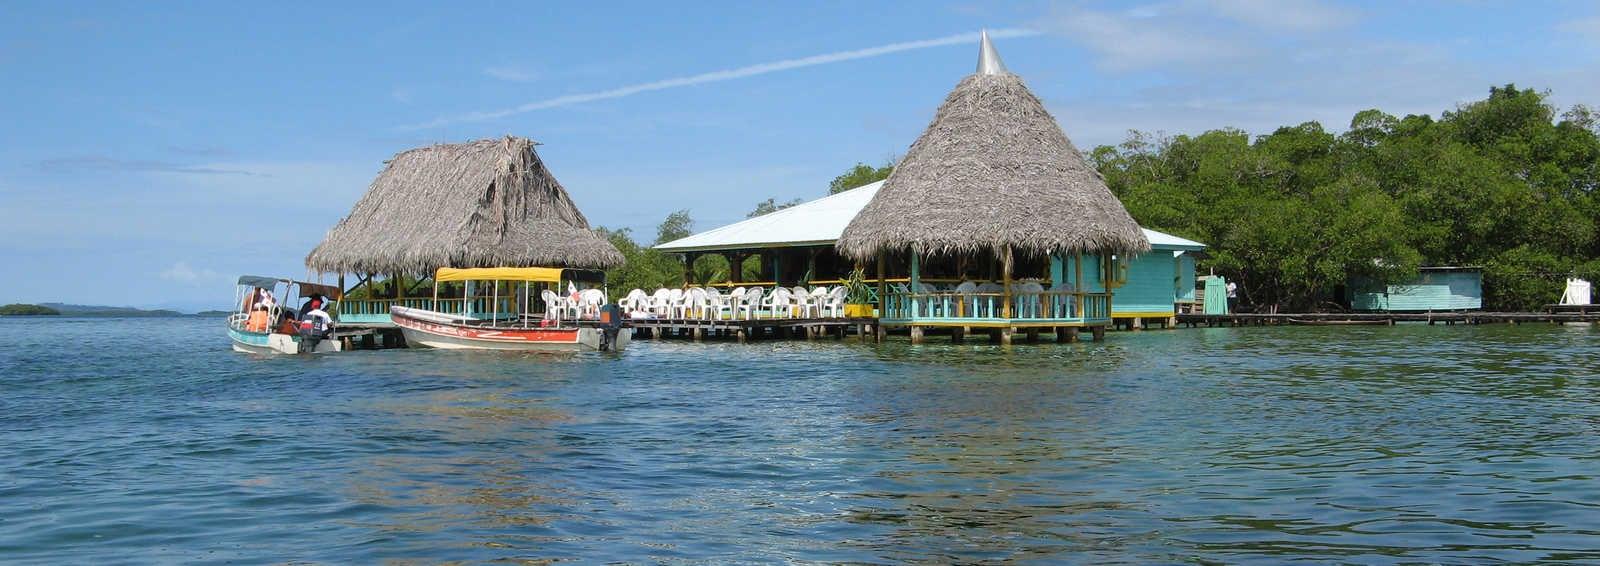 Waterside restaurant, Bocas del Toro Islands, Panama